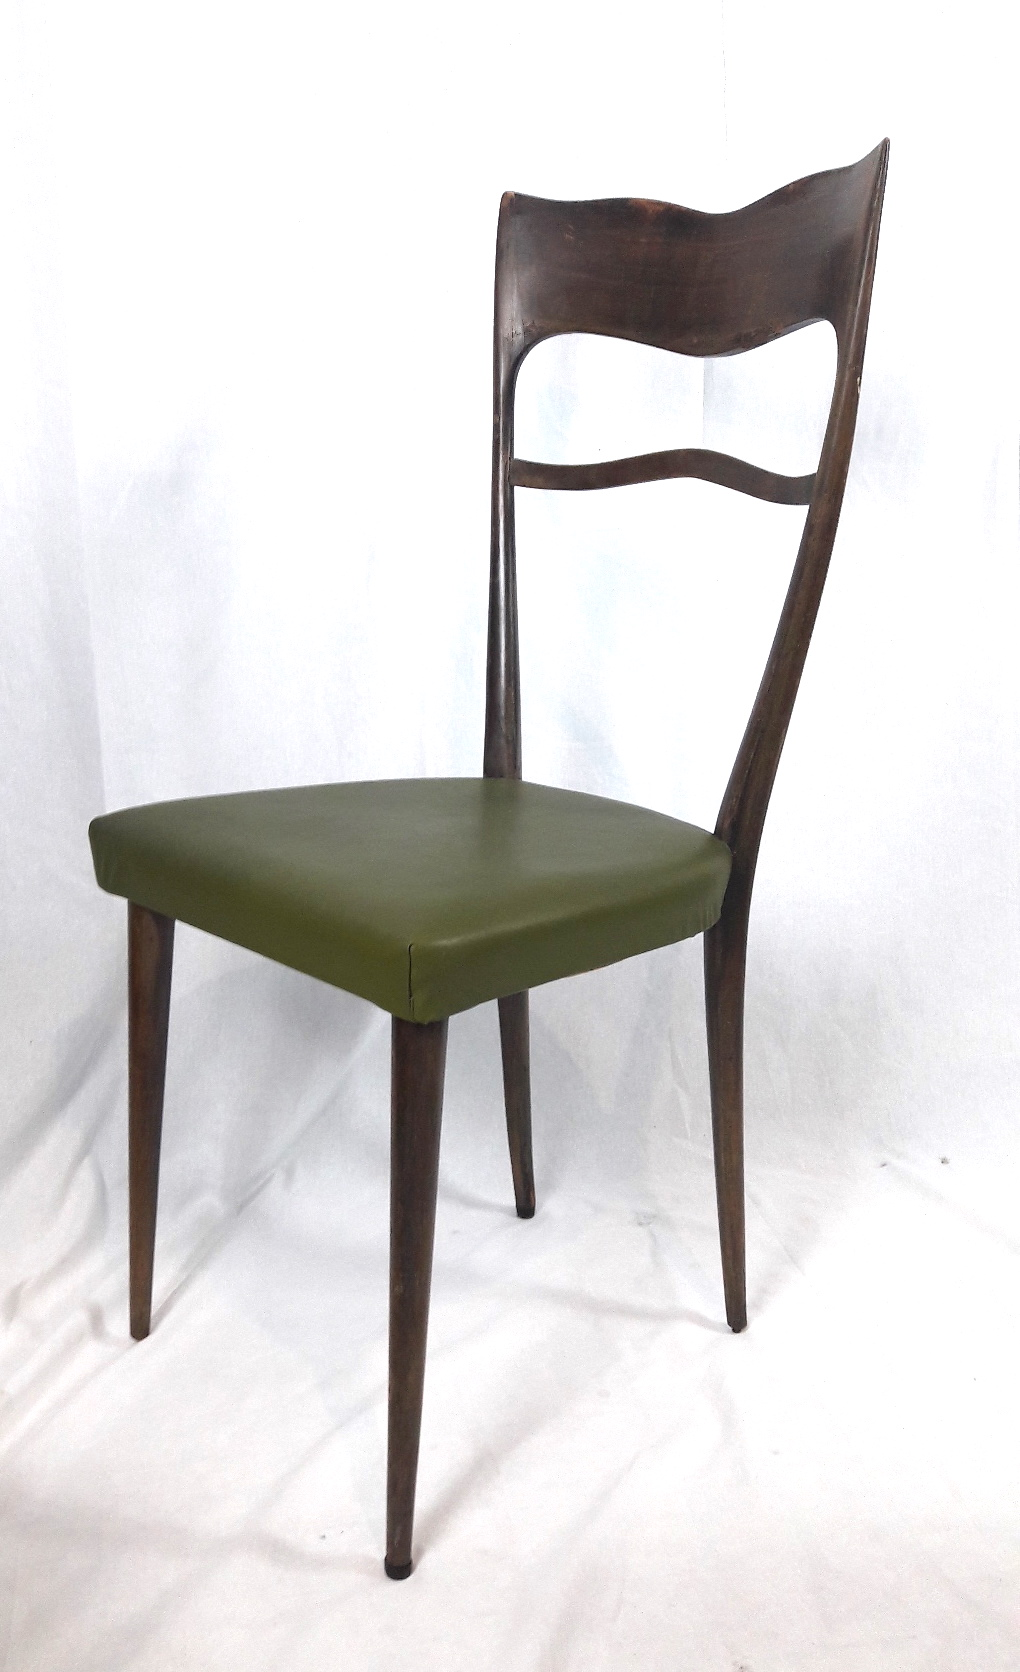 a28-set-mid-century-italian-chairs-50